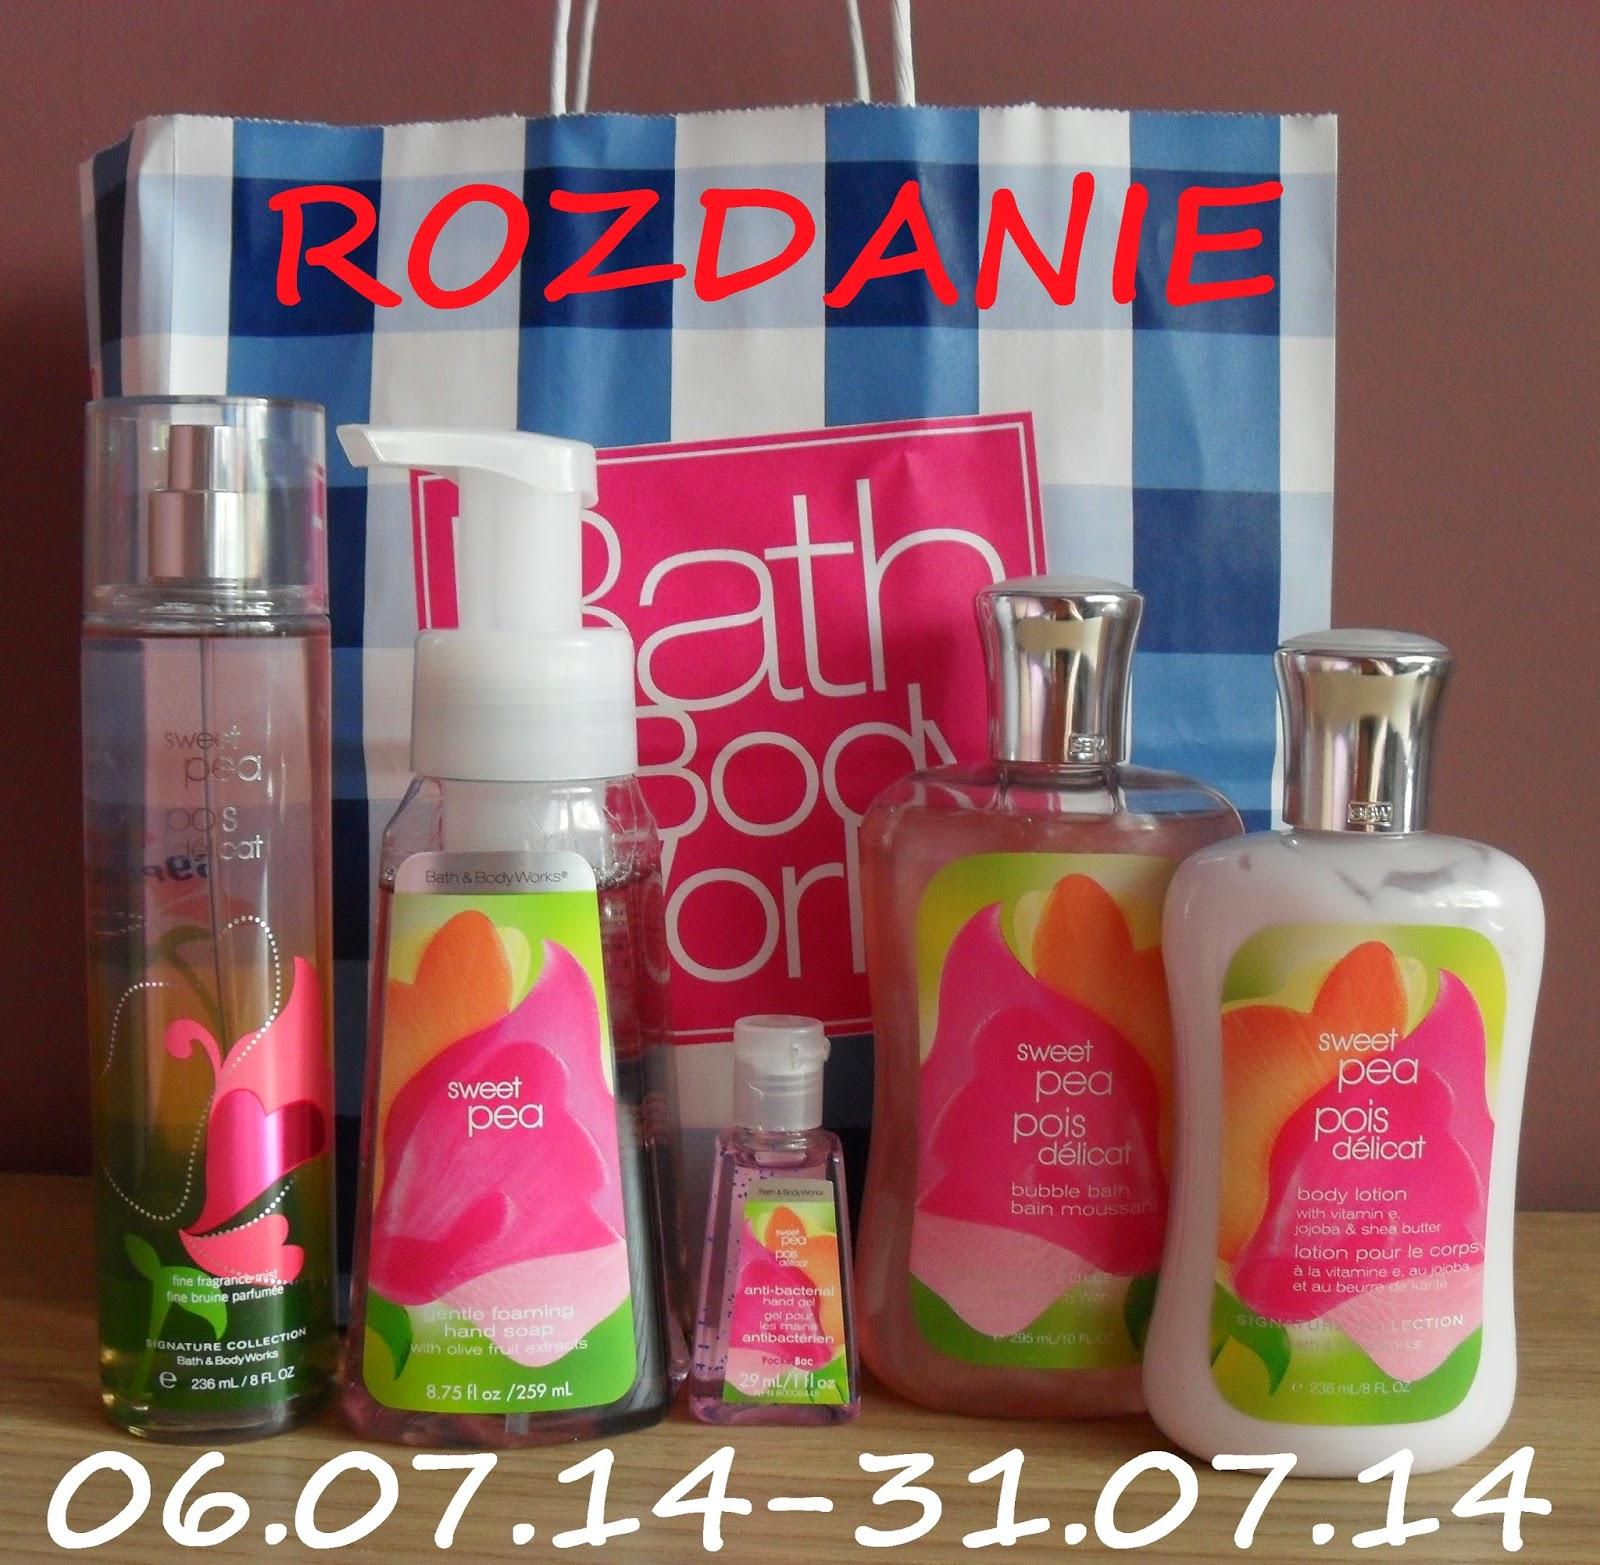 http://paulla-beauty.blogspot.com/2014/07/zapraszam-na-rozdanie-06072014-31072014.html